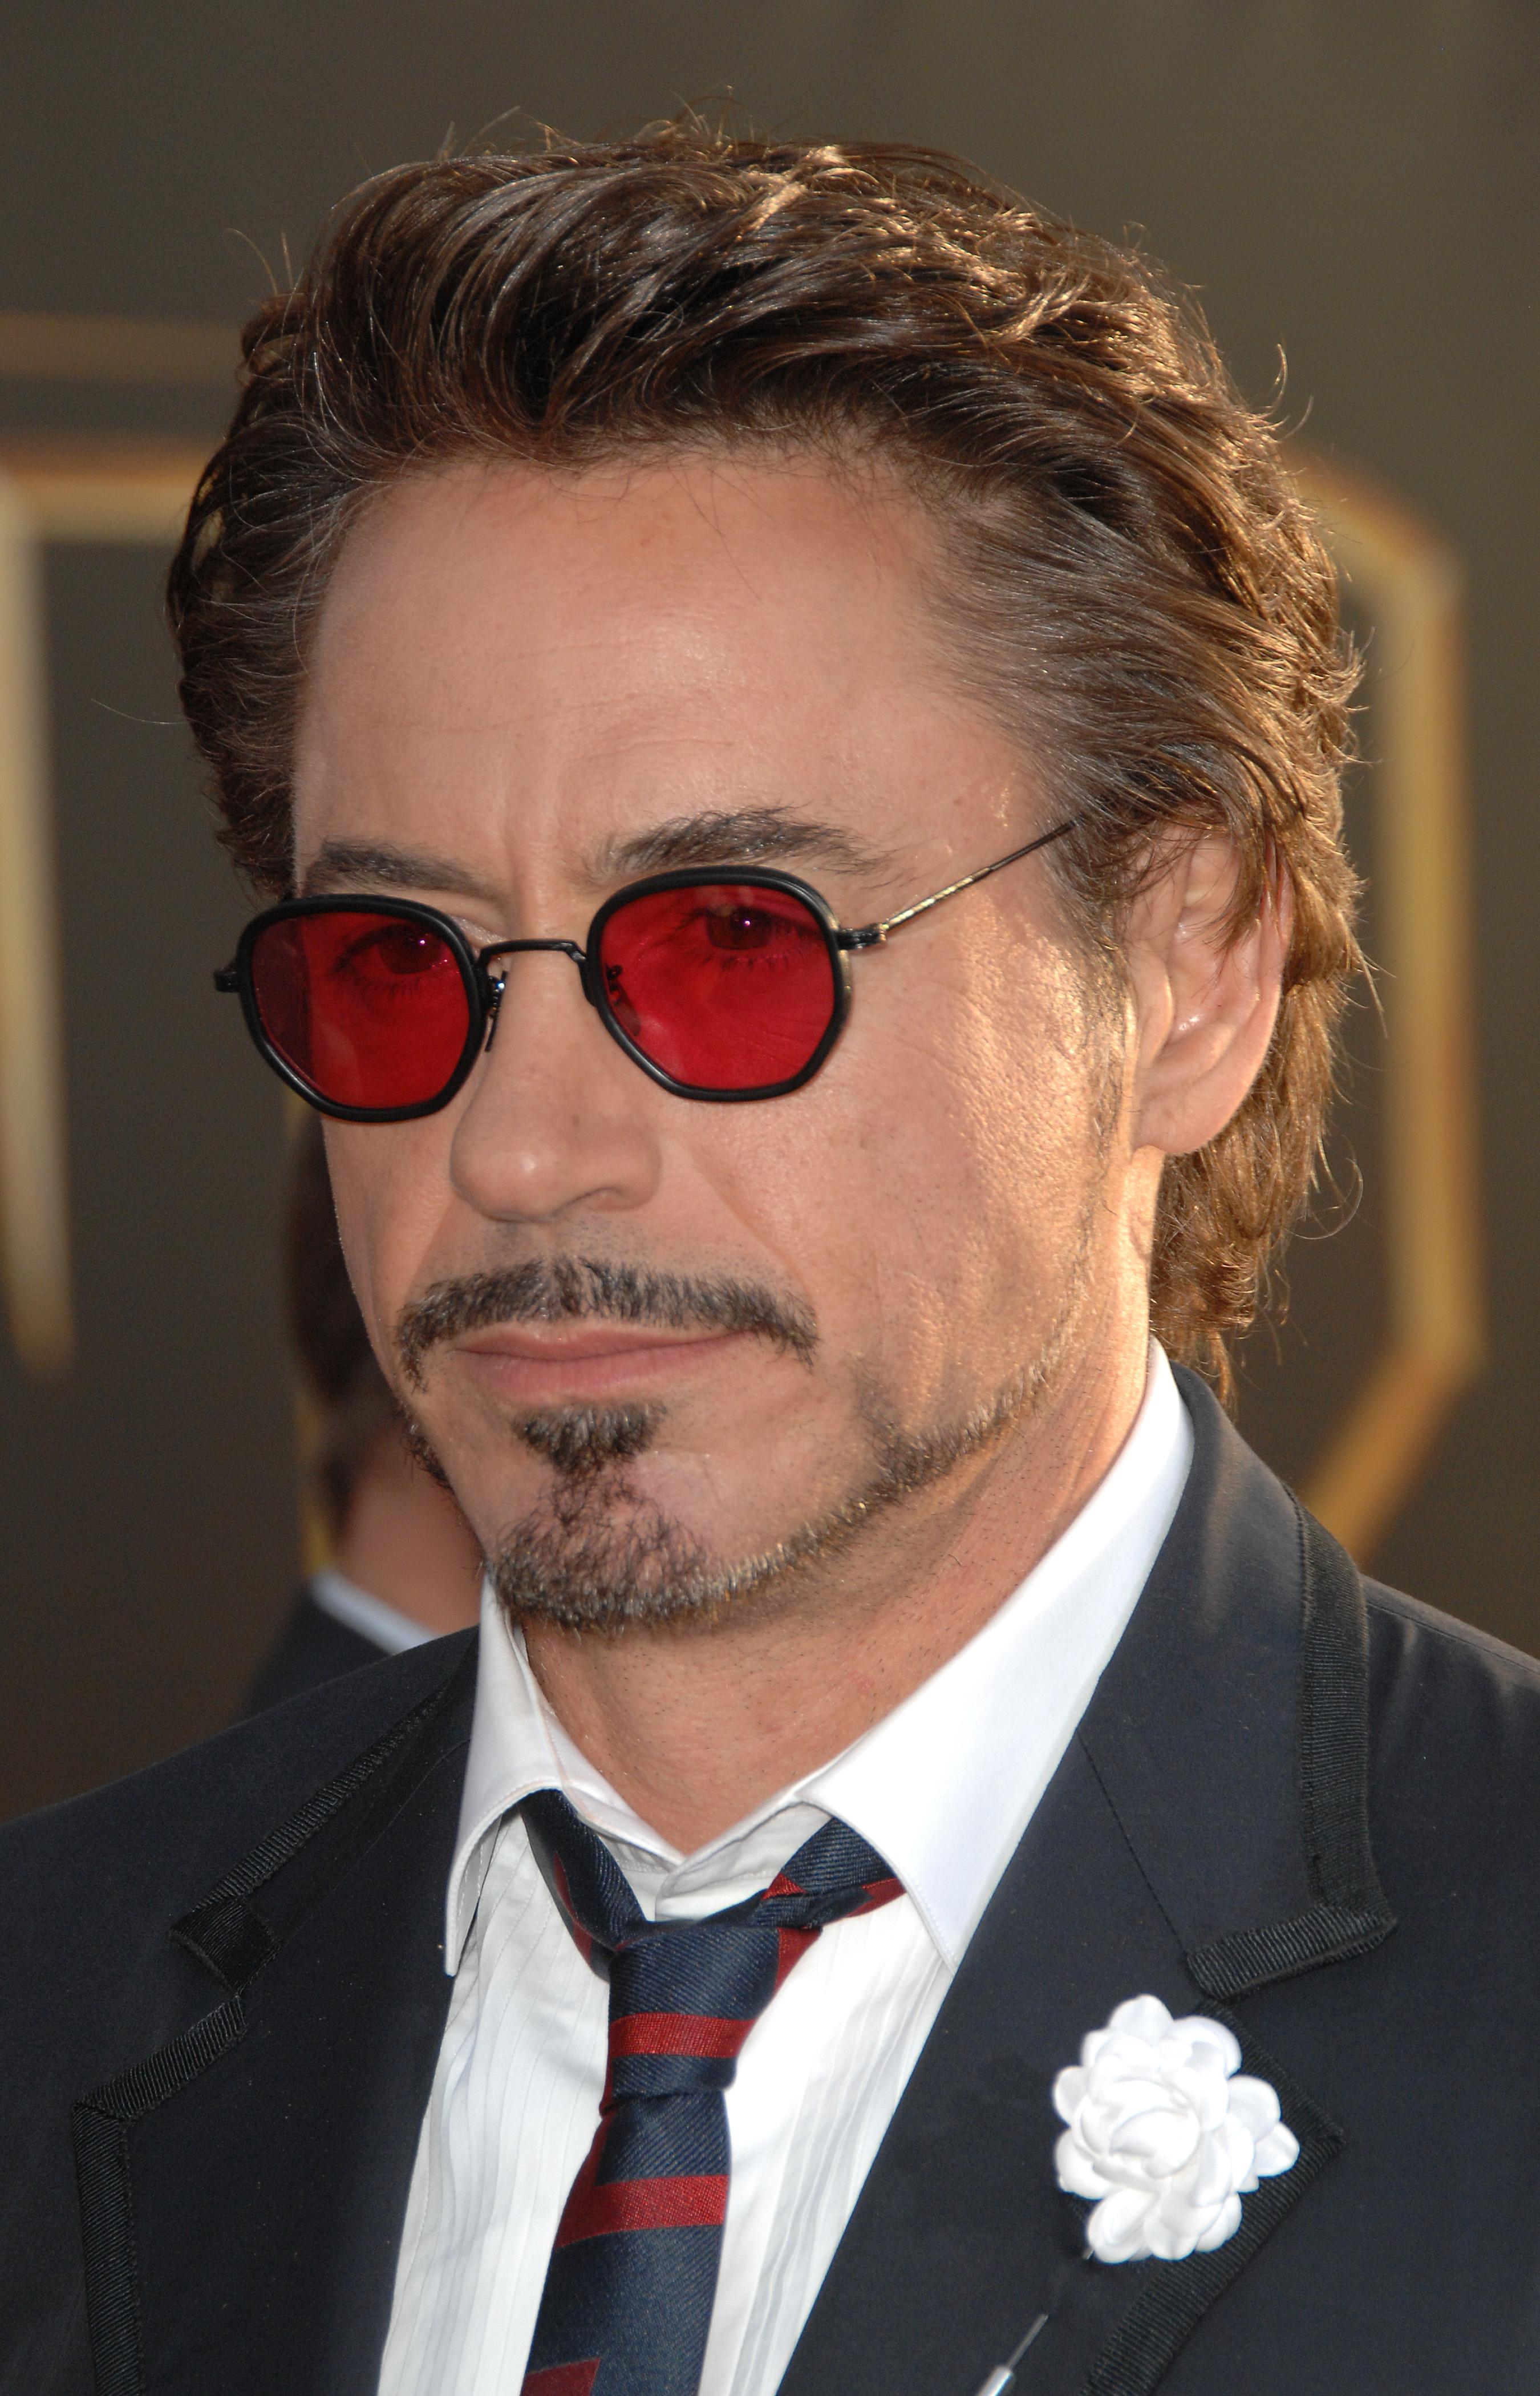 Robert Downey Jr. heroin